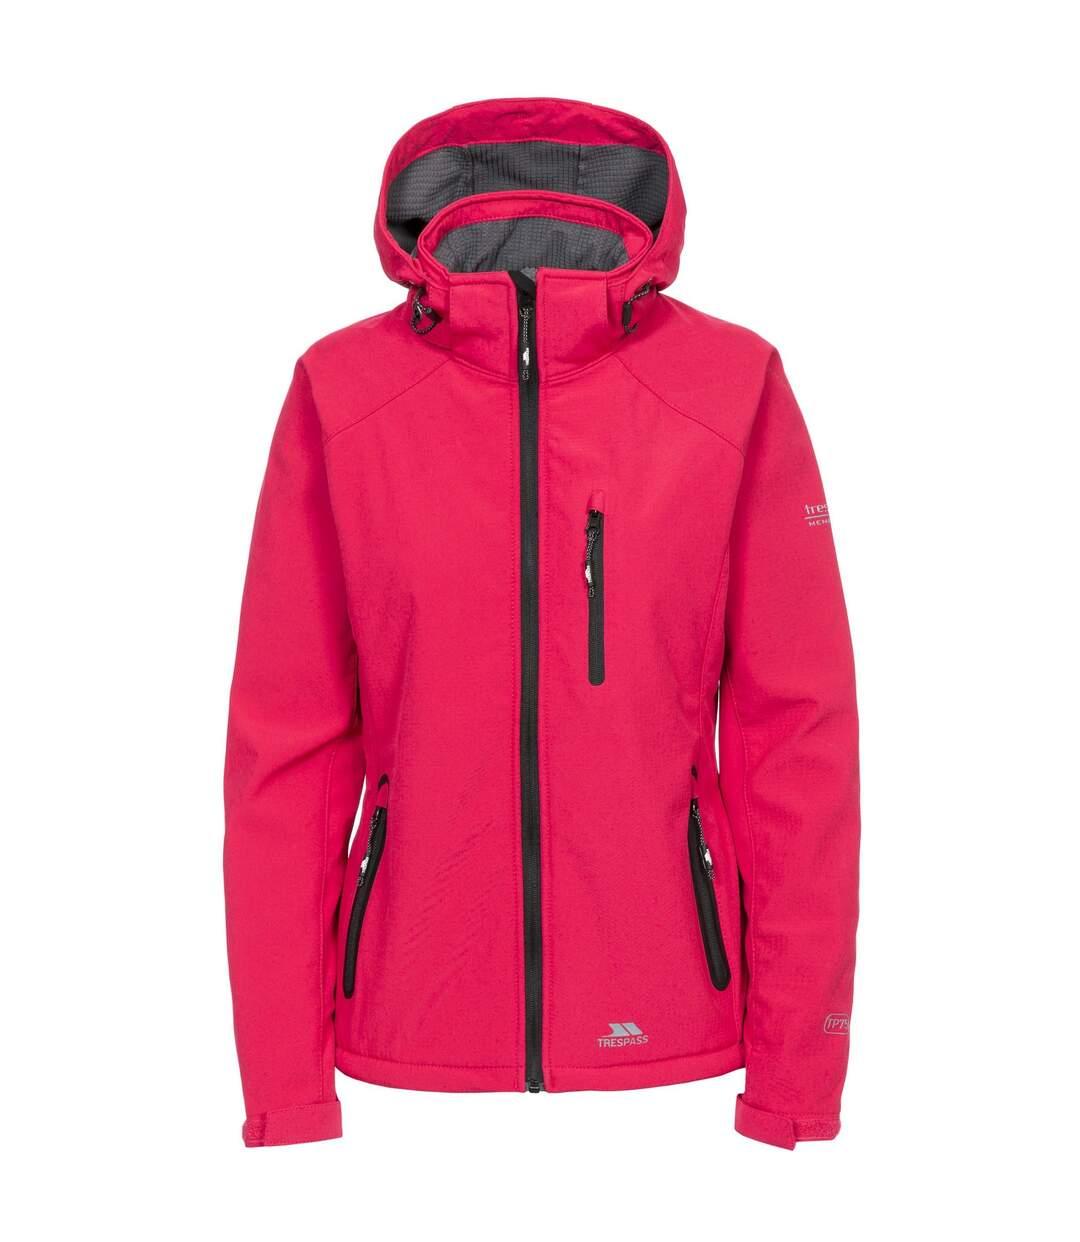 Trespass Womens/Ladies Bela II Waterproof Softshell Jacket (Raspberry) - UTTP3440